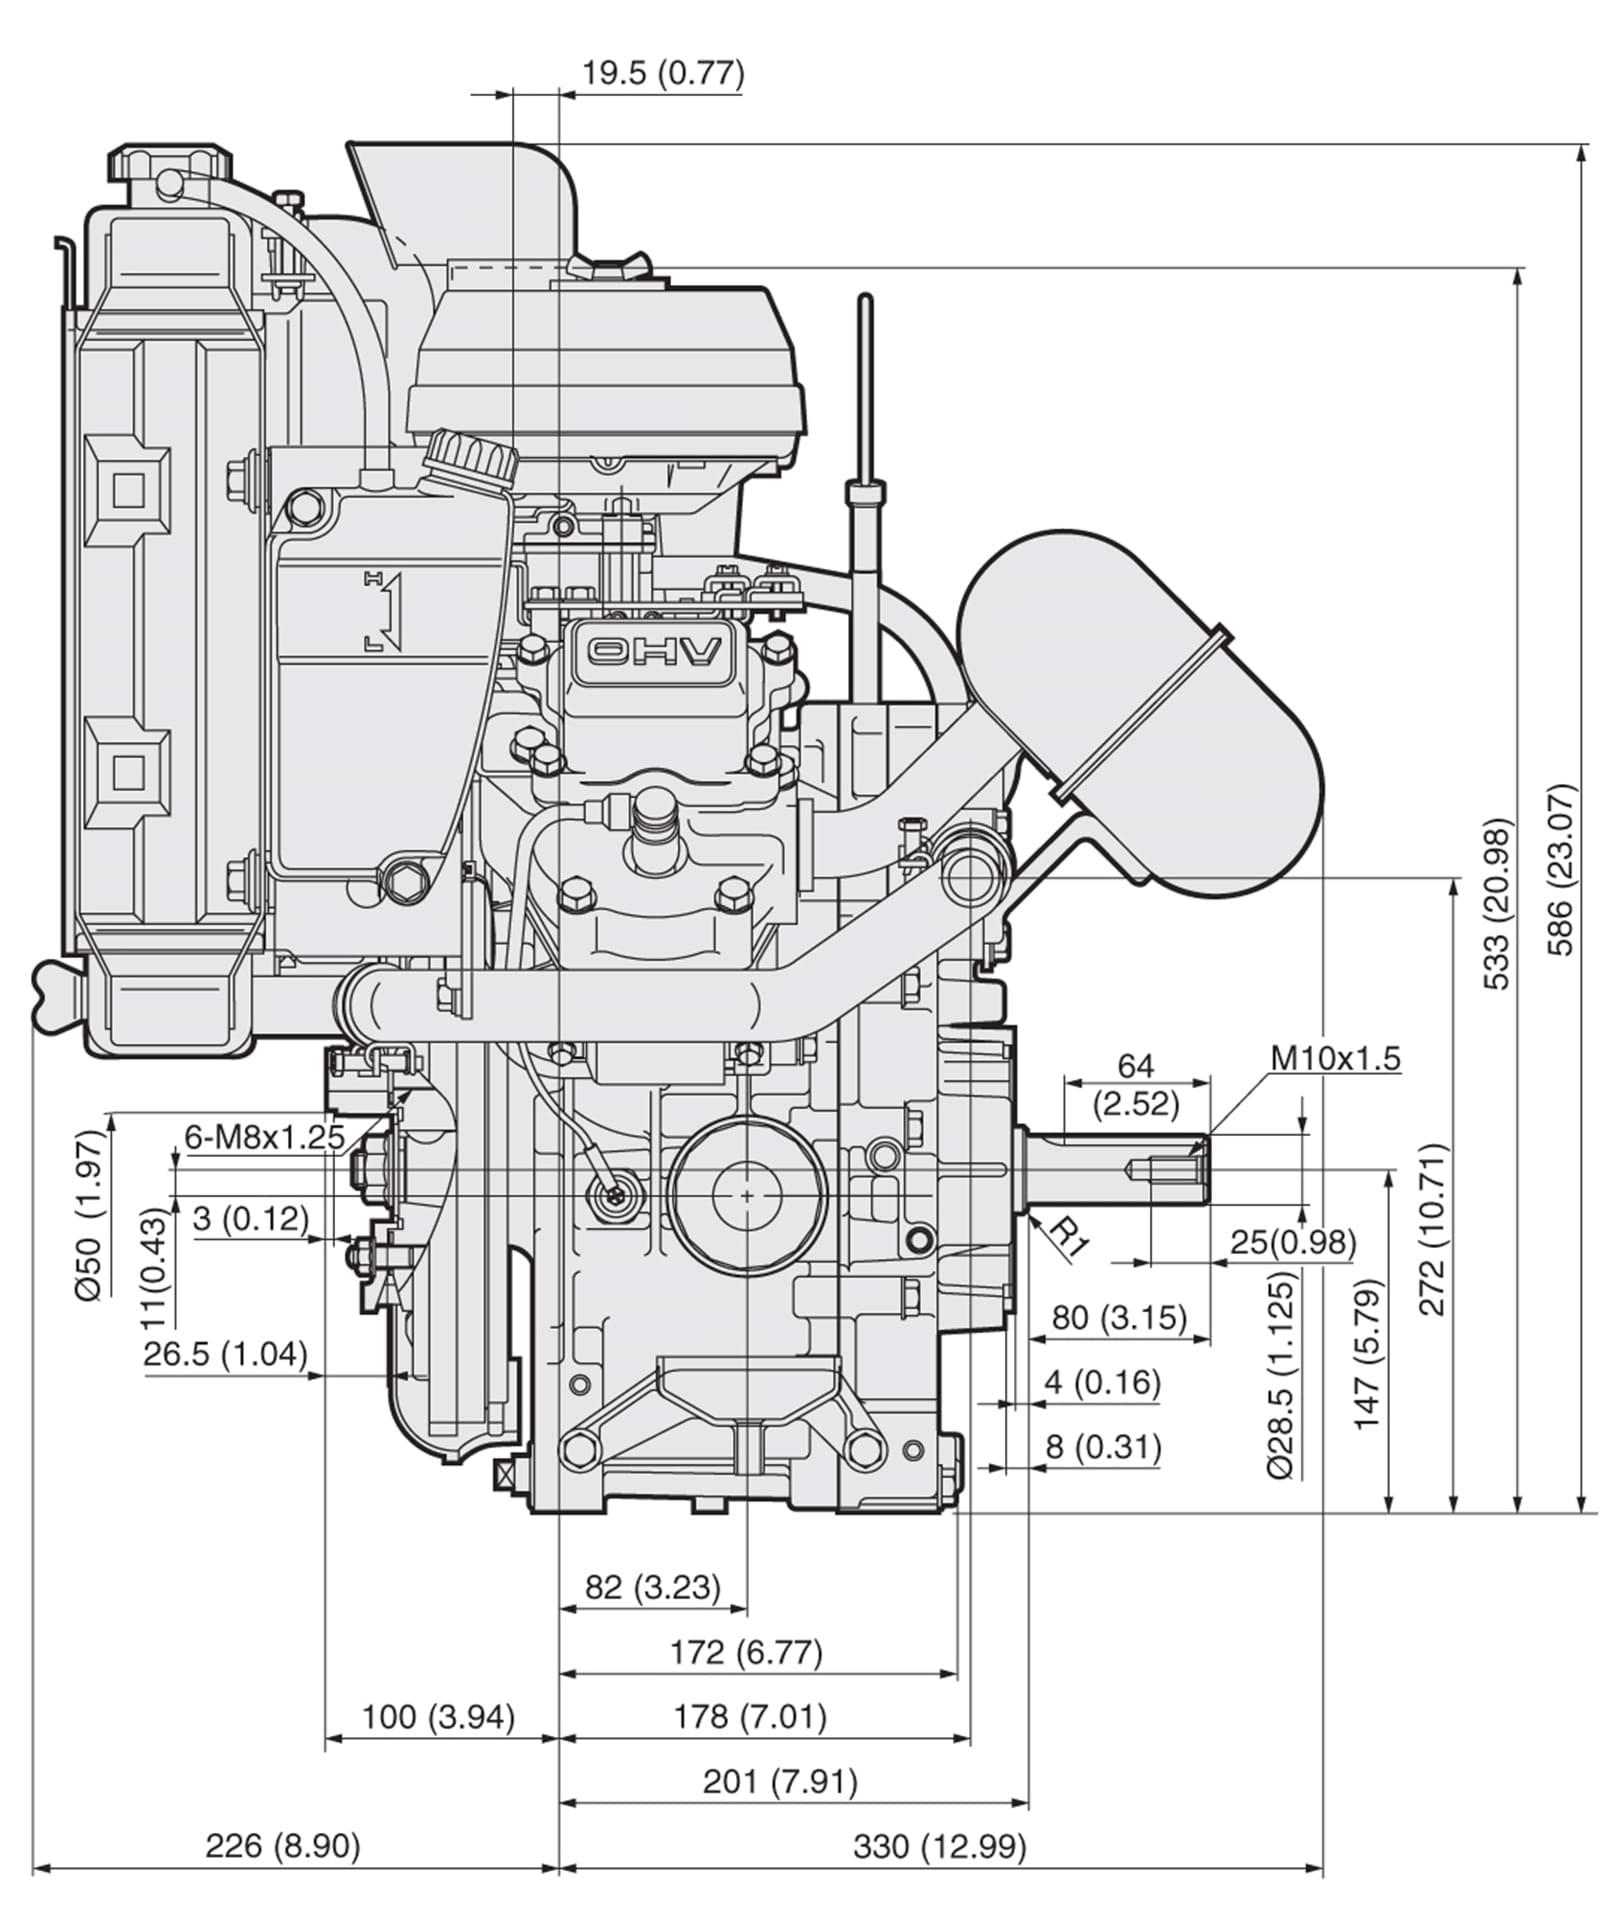 Kawasaki Engines Technical Support